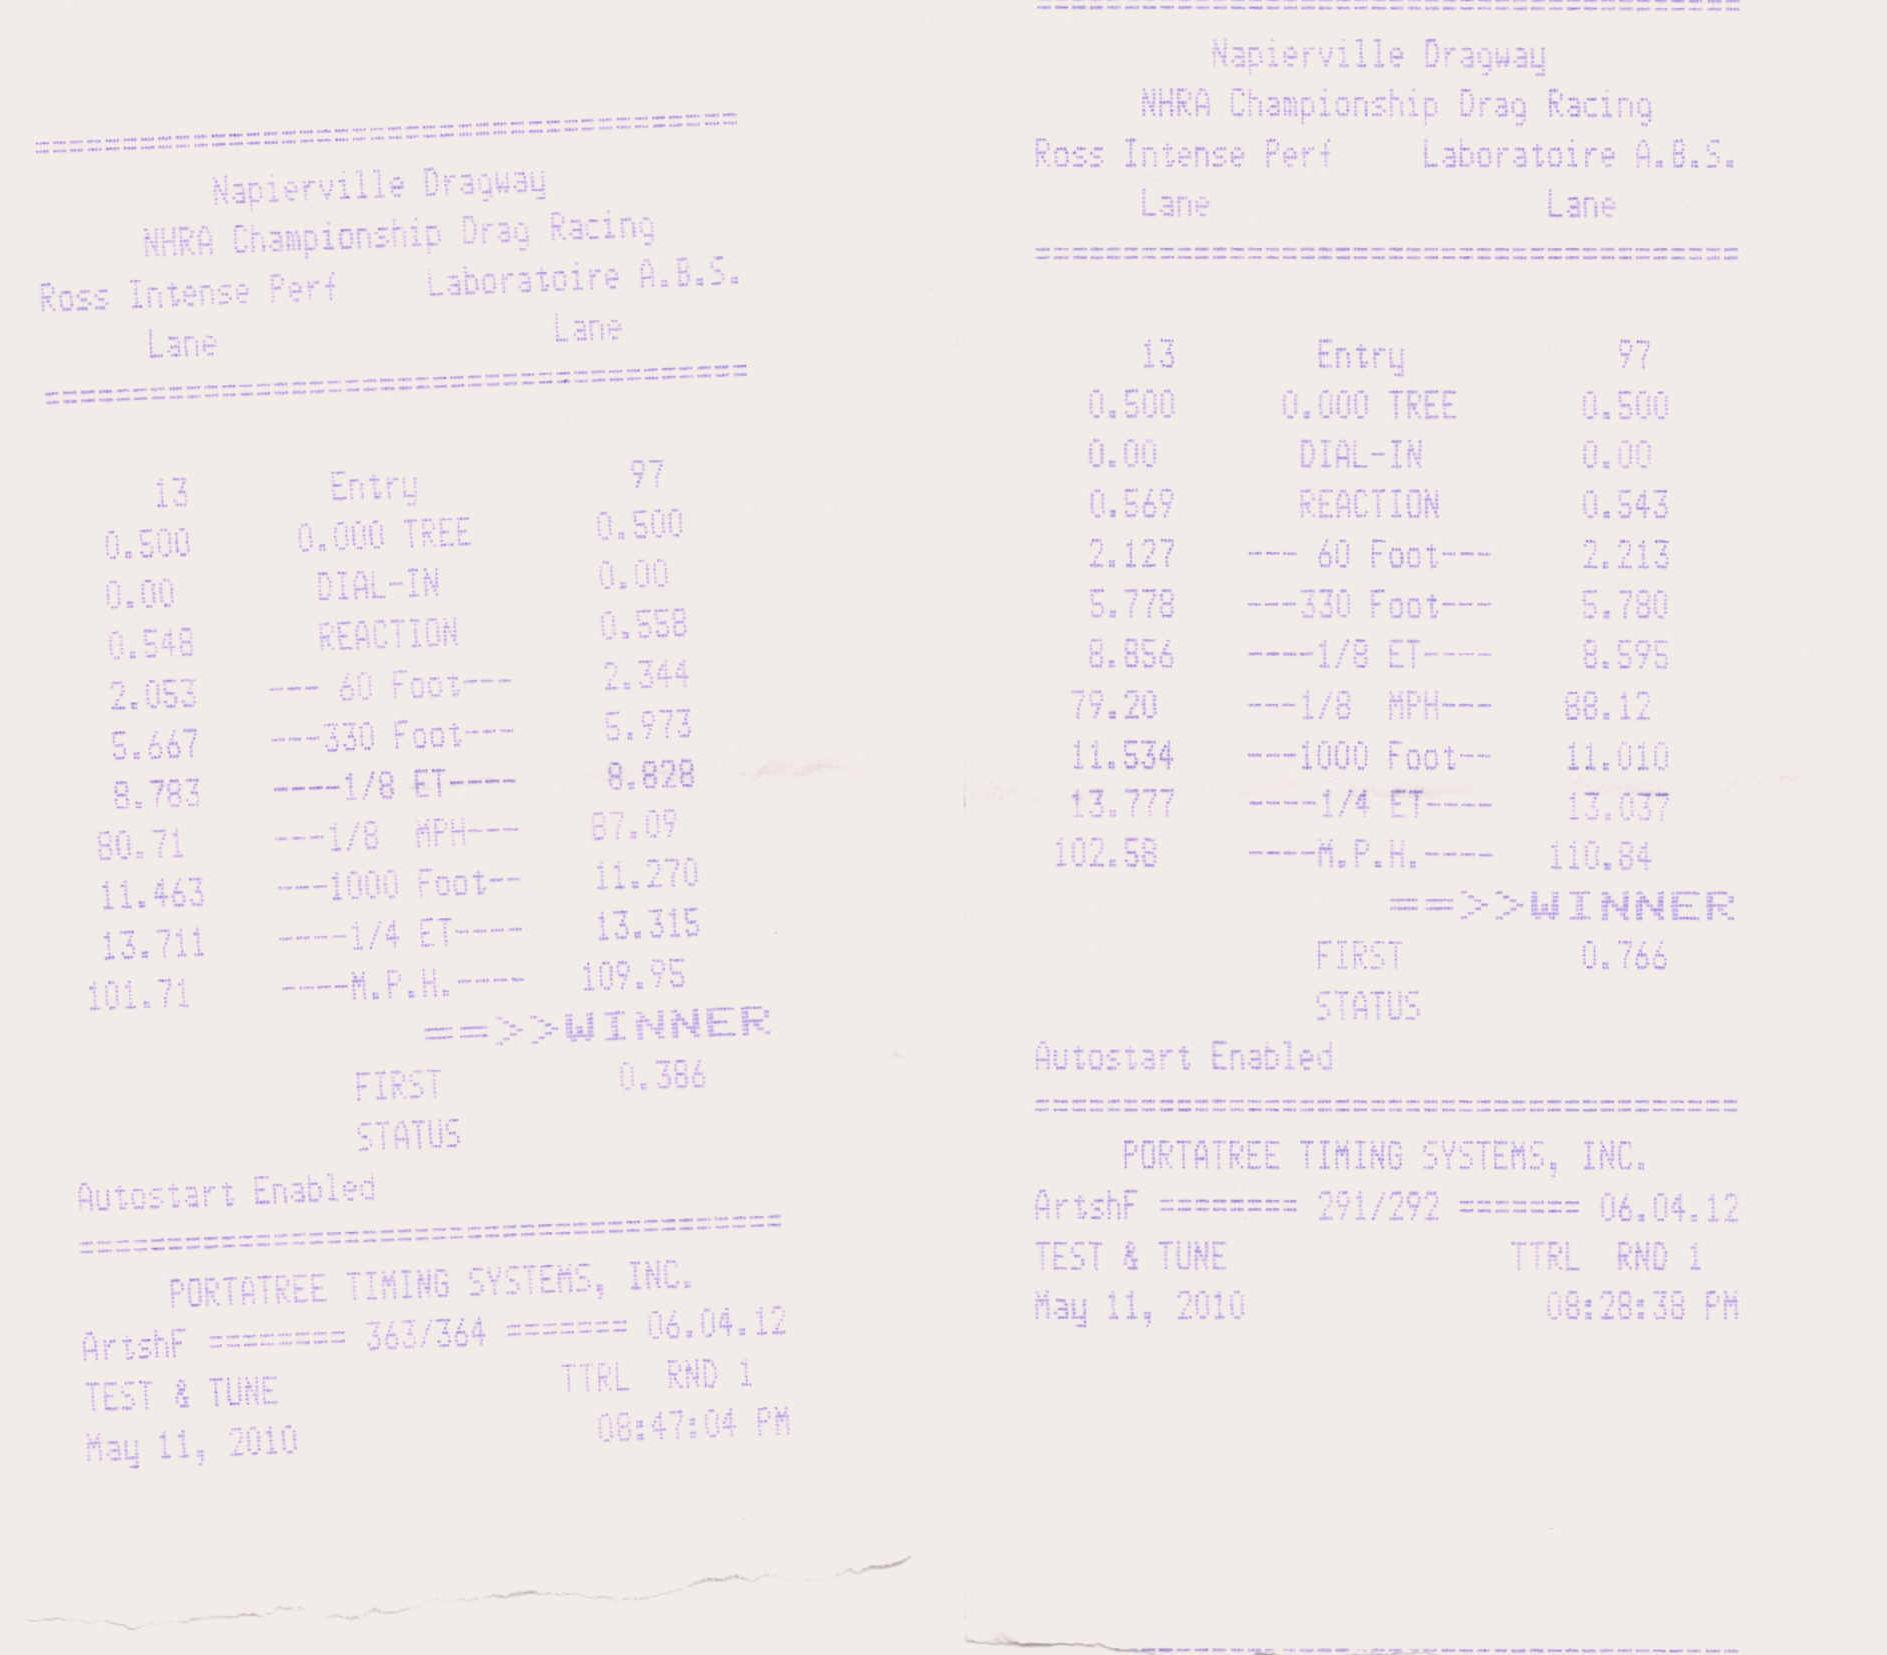 Mitsubishi Lancer EVO Timeslip Scan